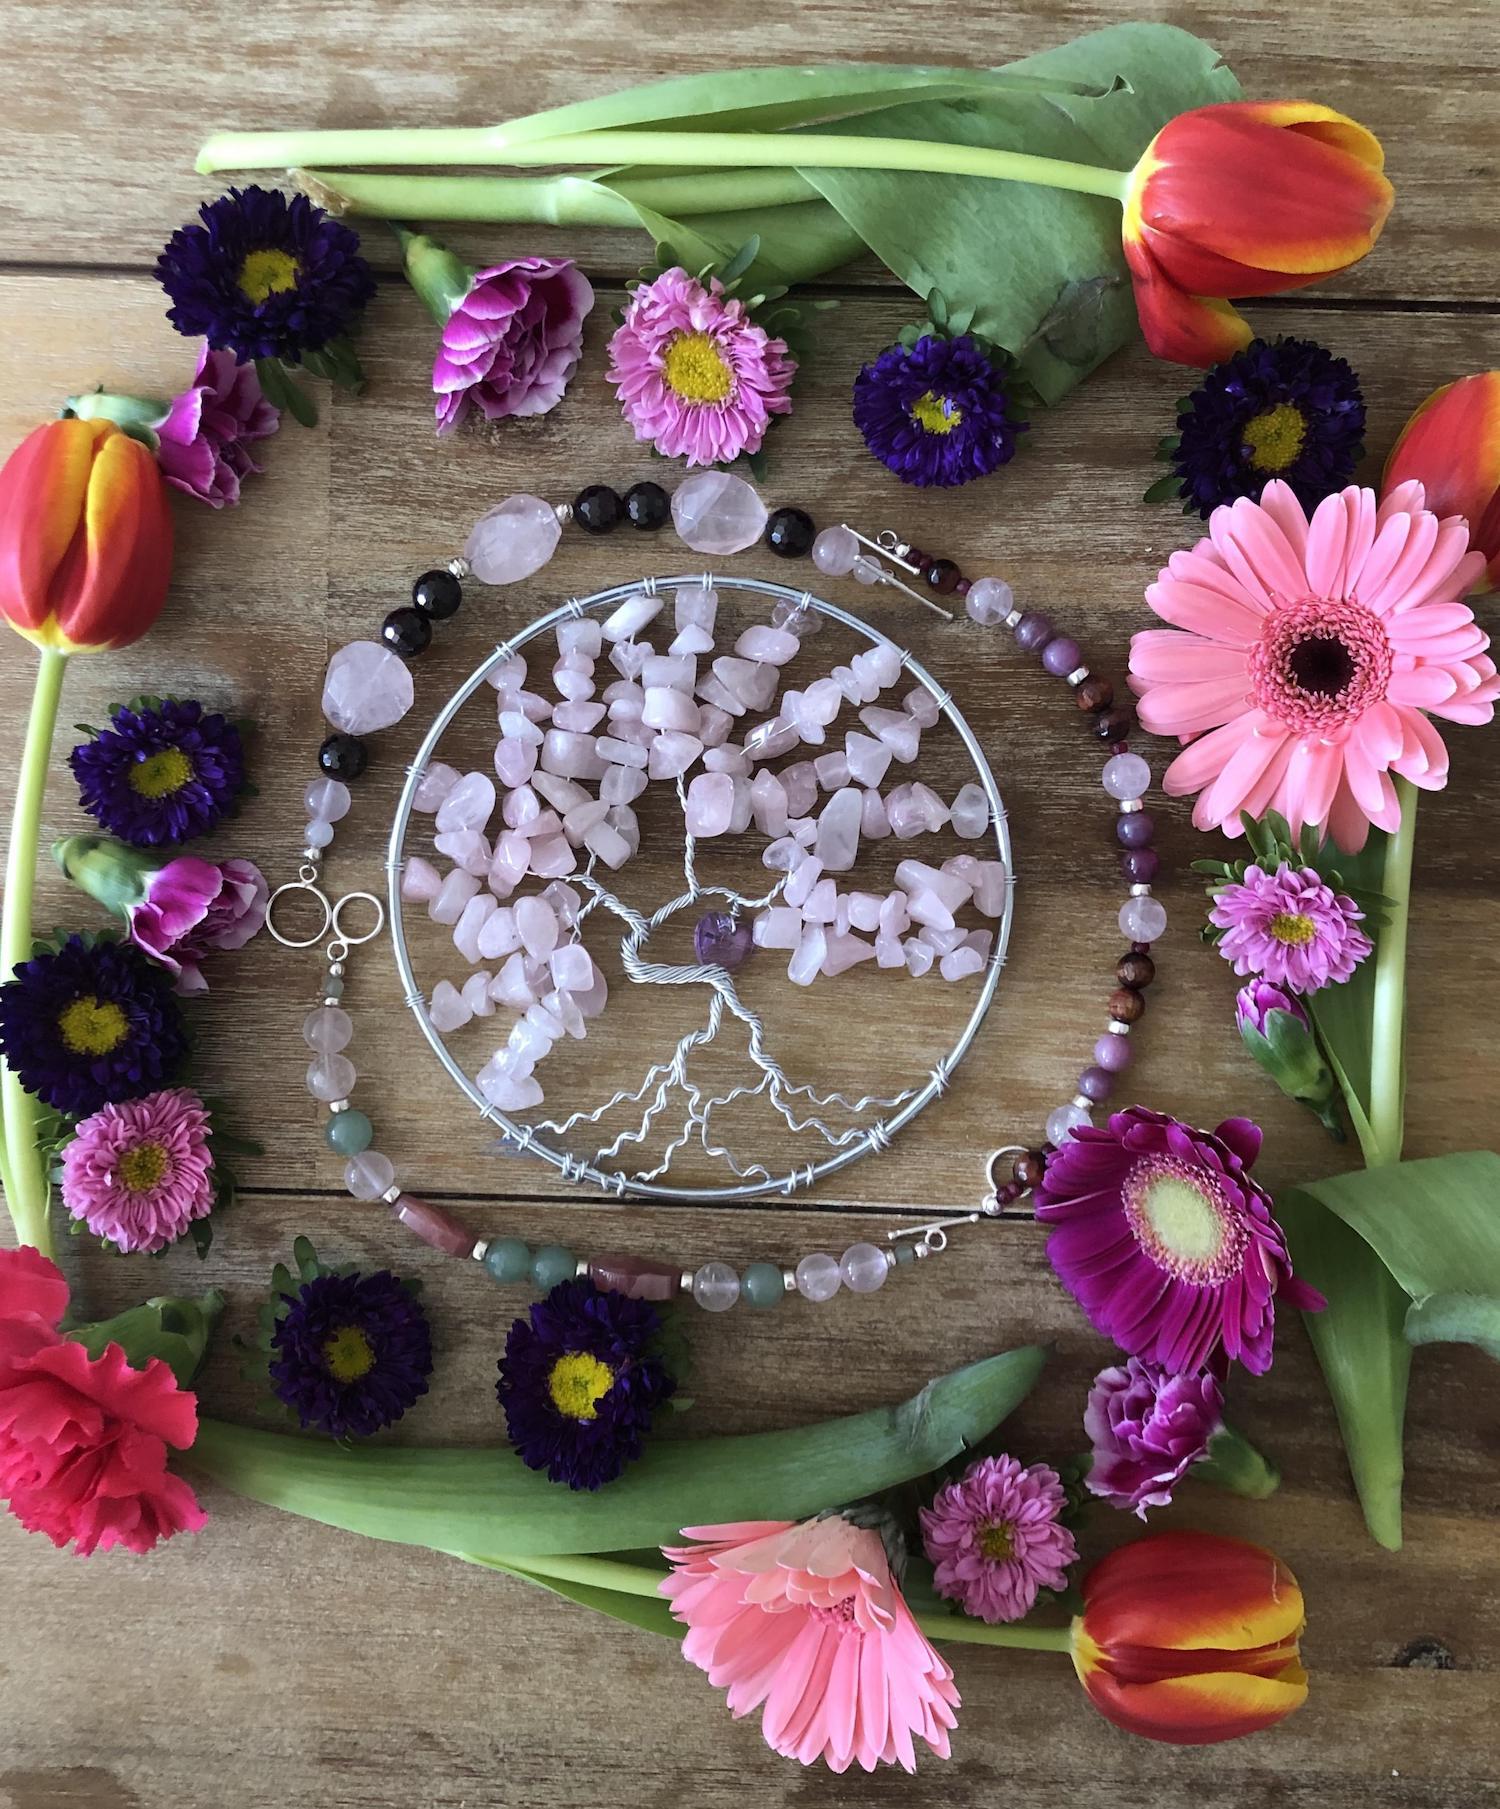 tree_of_life_gemstone_rose_quartz_02.min